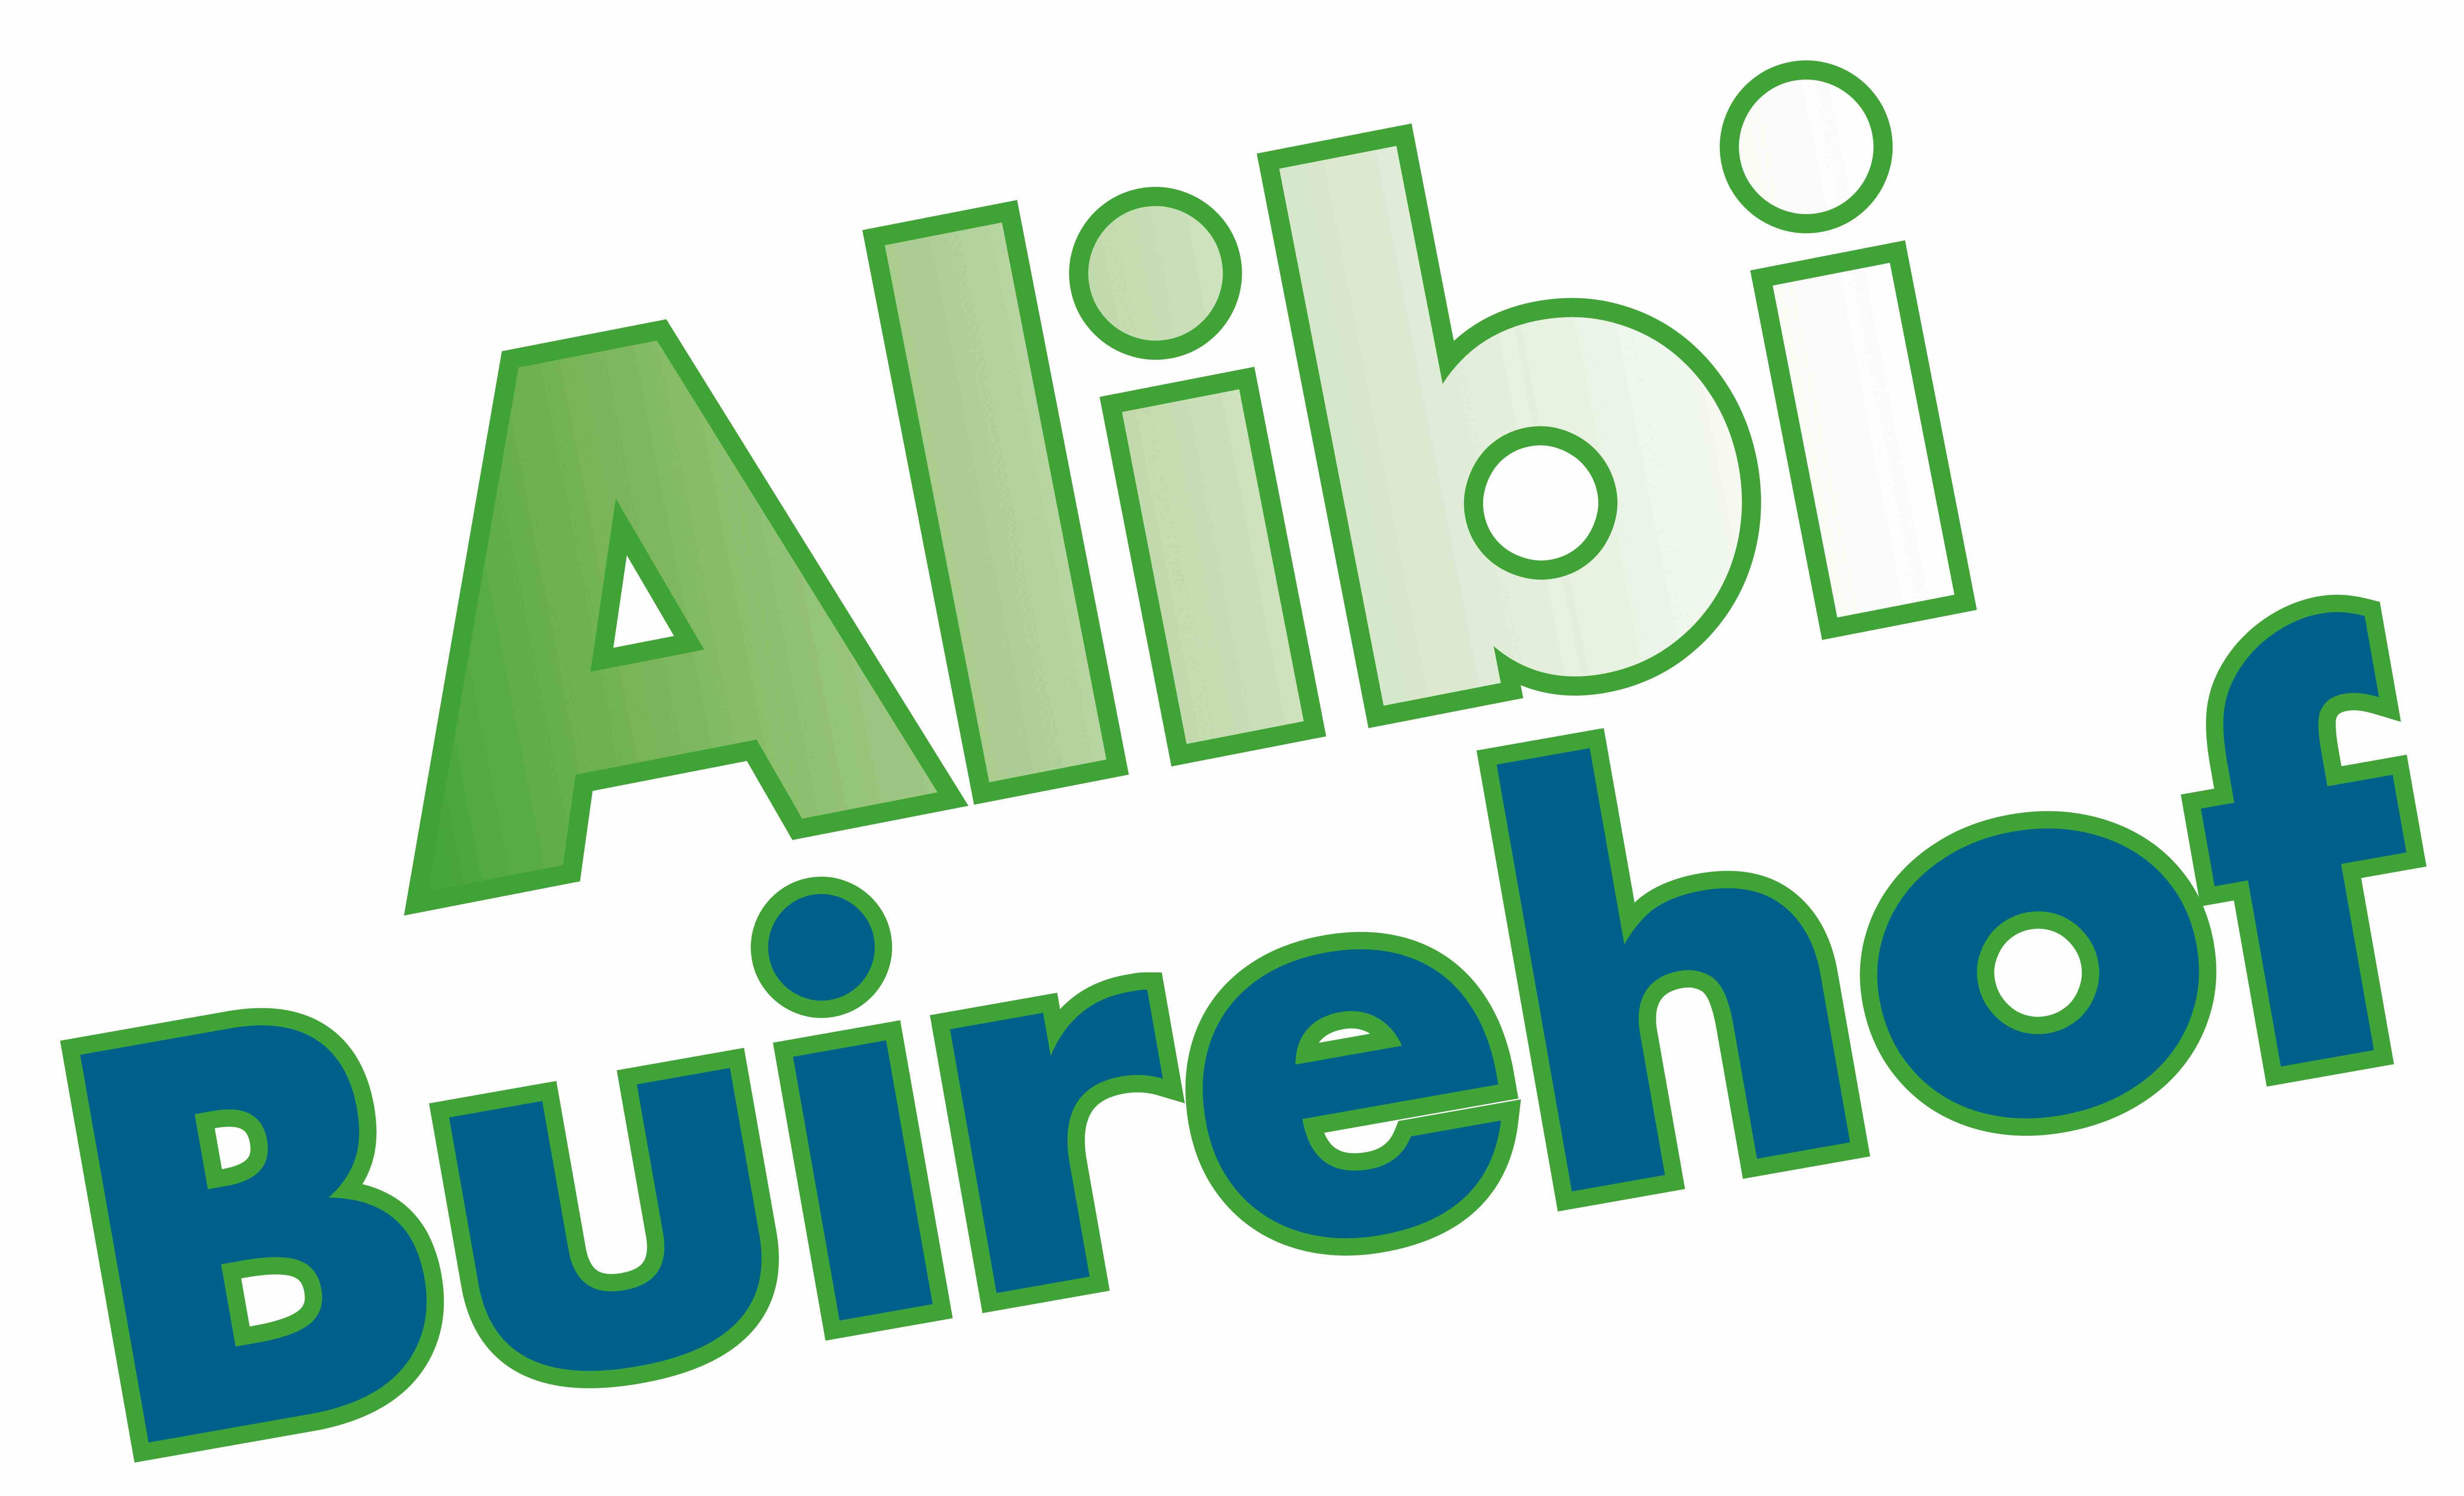 Alibi Buirehof